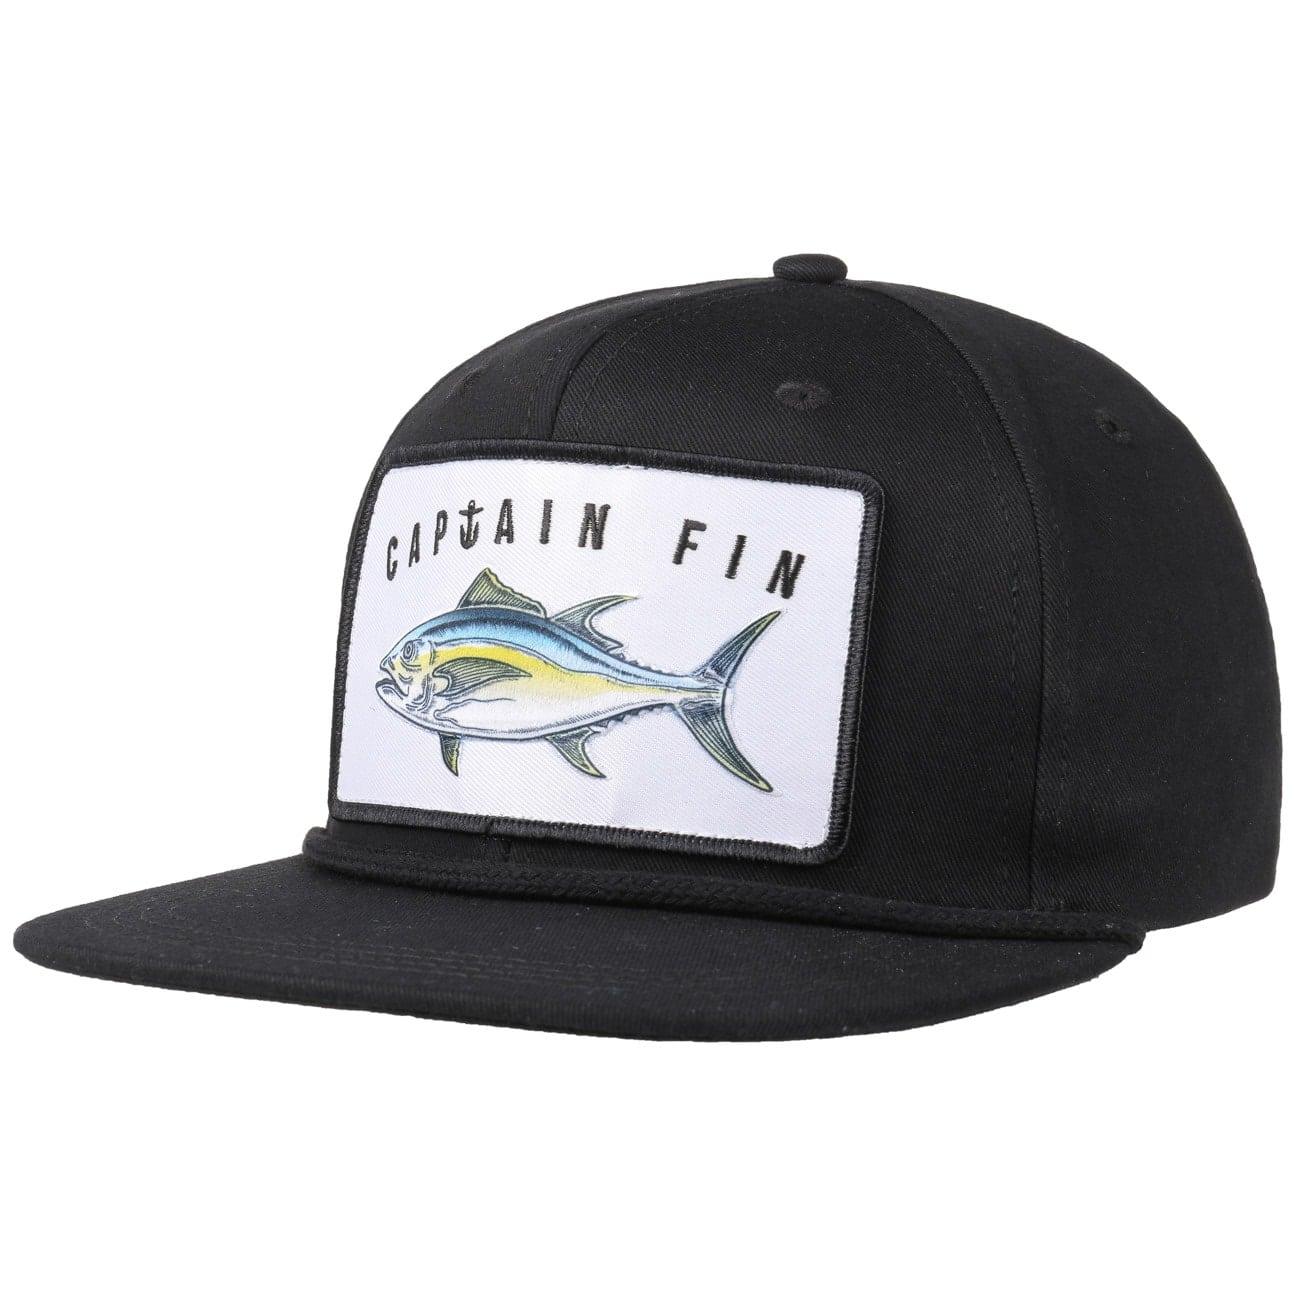 Casquette Snapback Tuna by Captain Fin  baseball cap